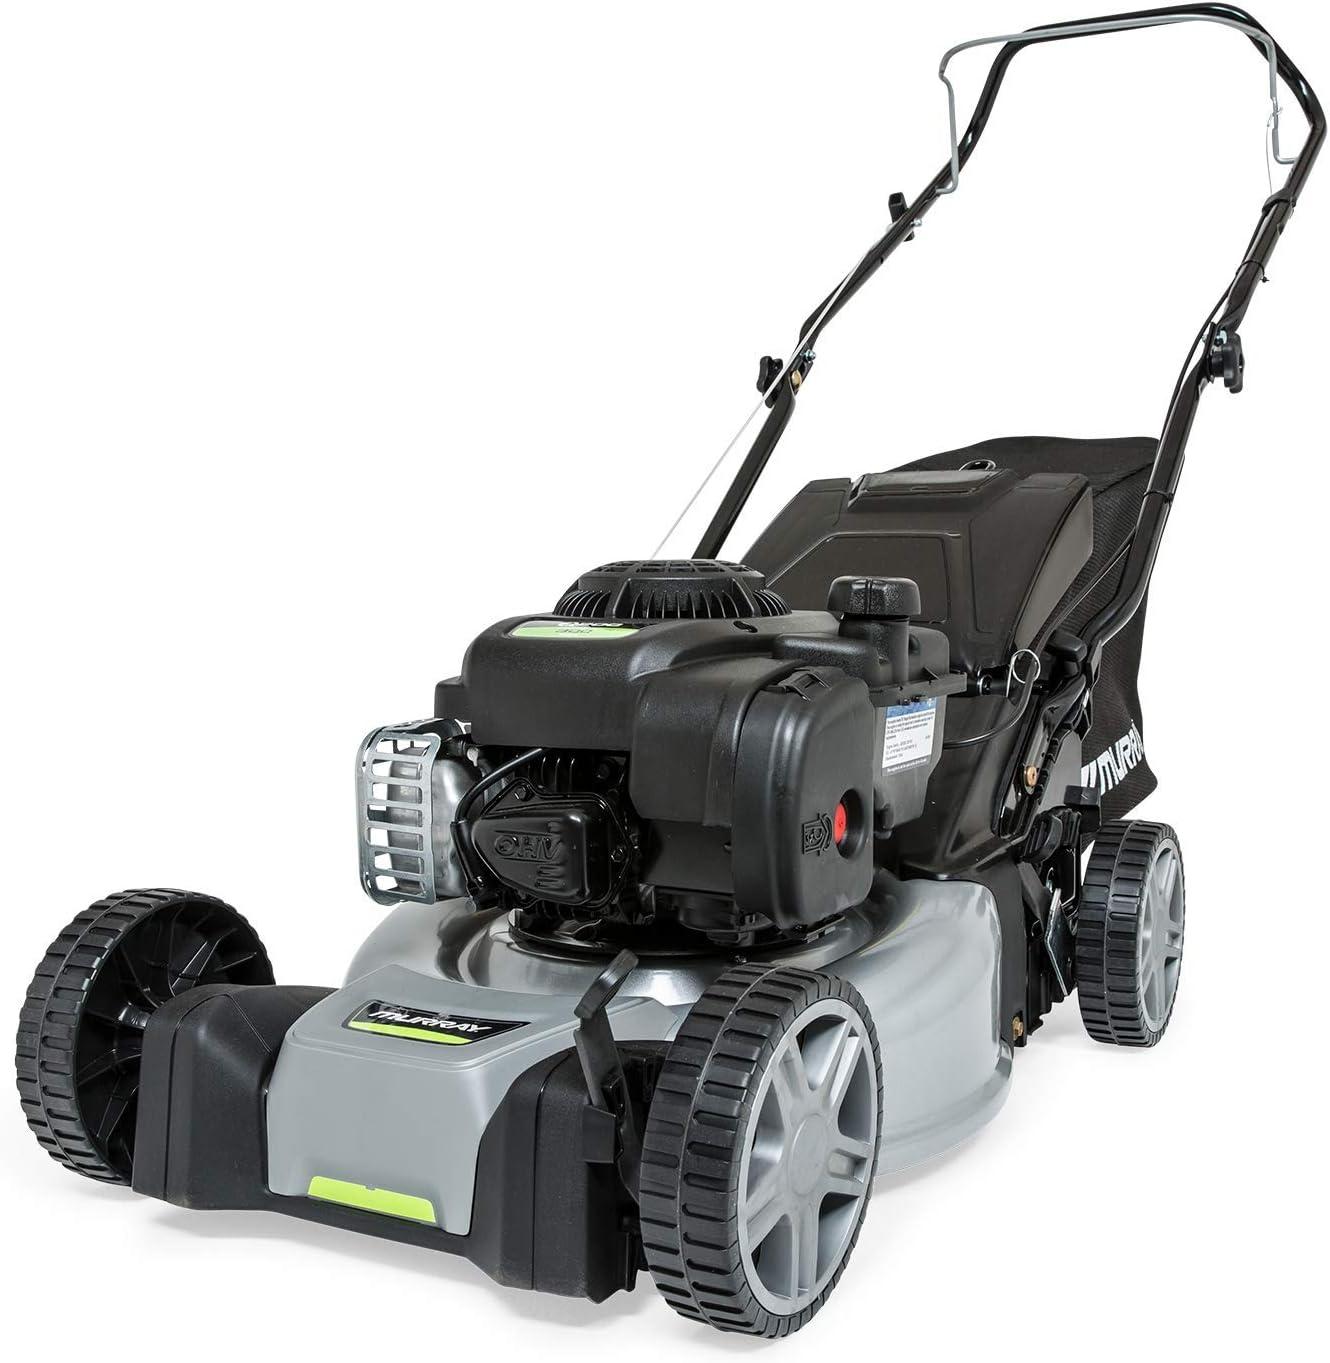 Murray EQ300 Self-propelled Petrol Lawn Mower